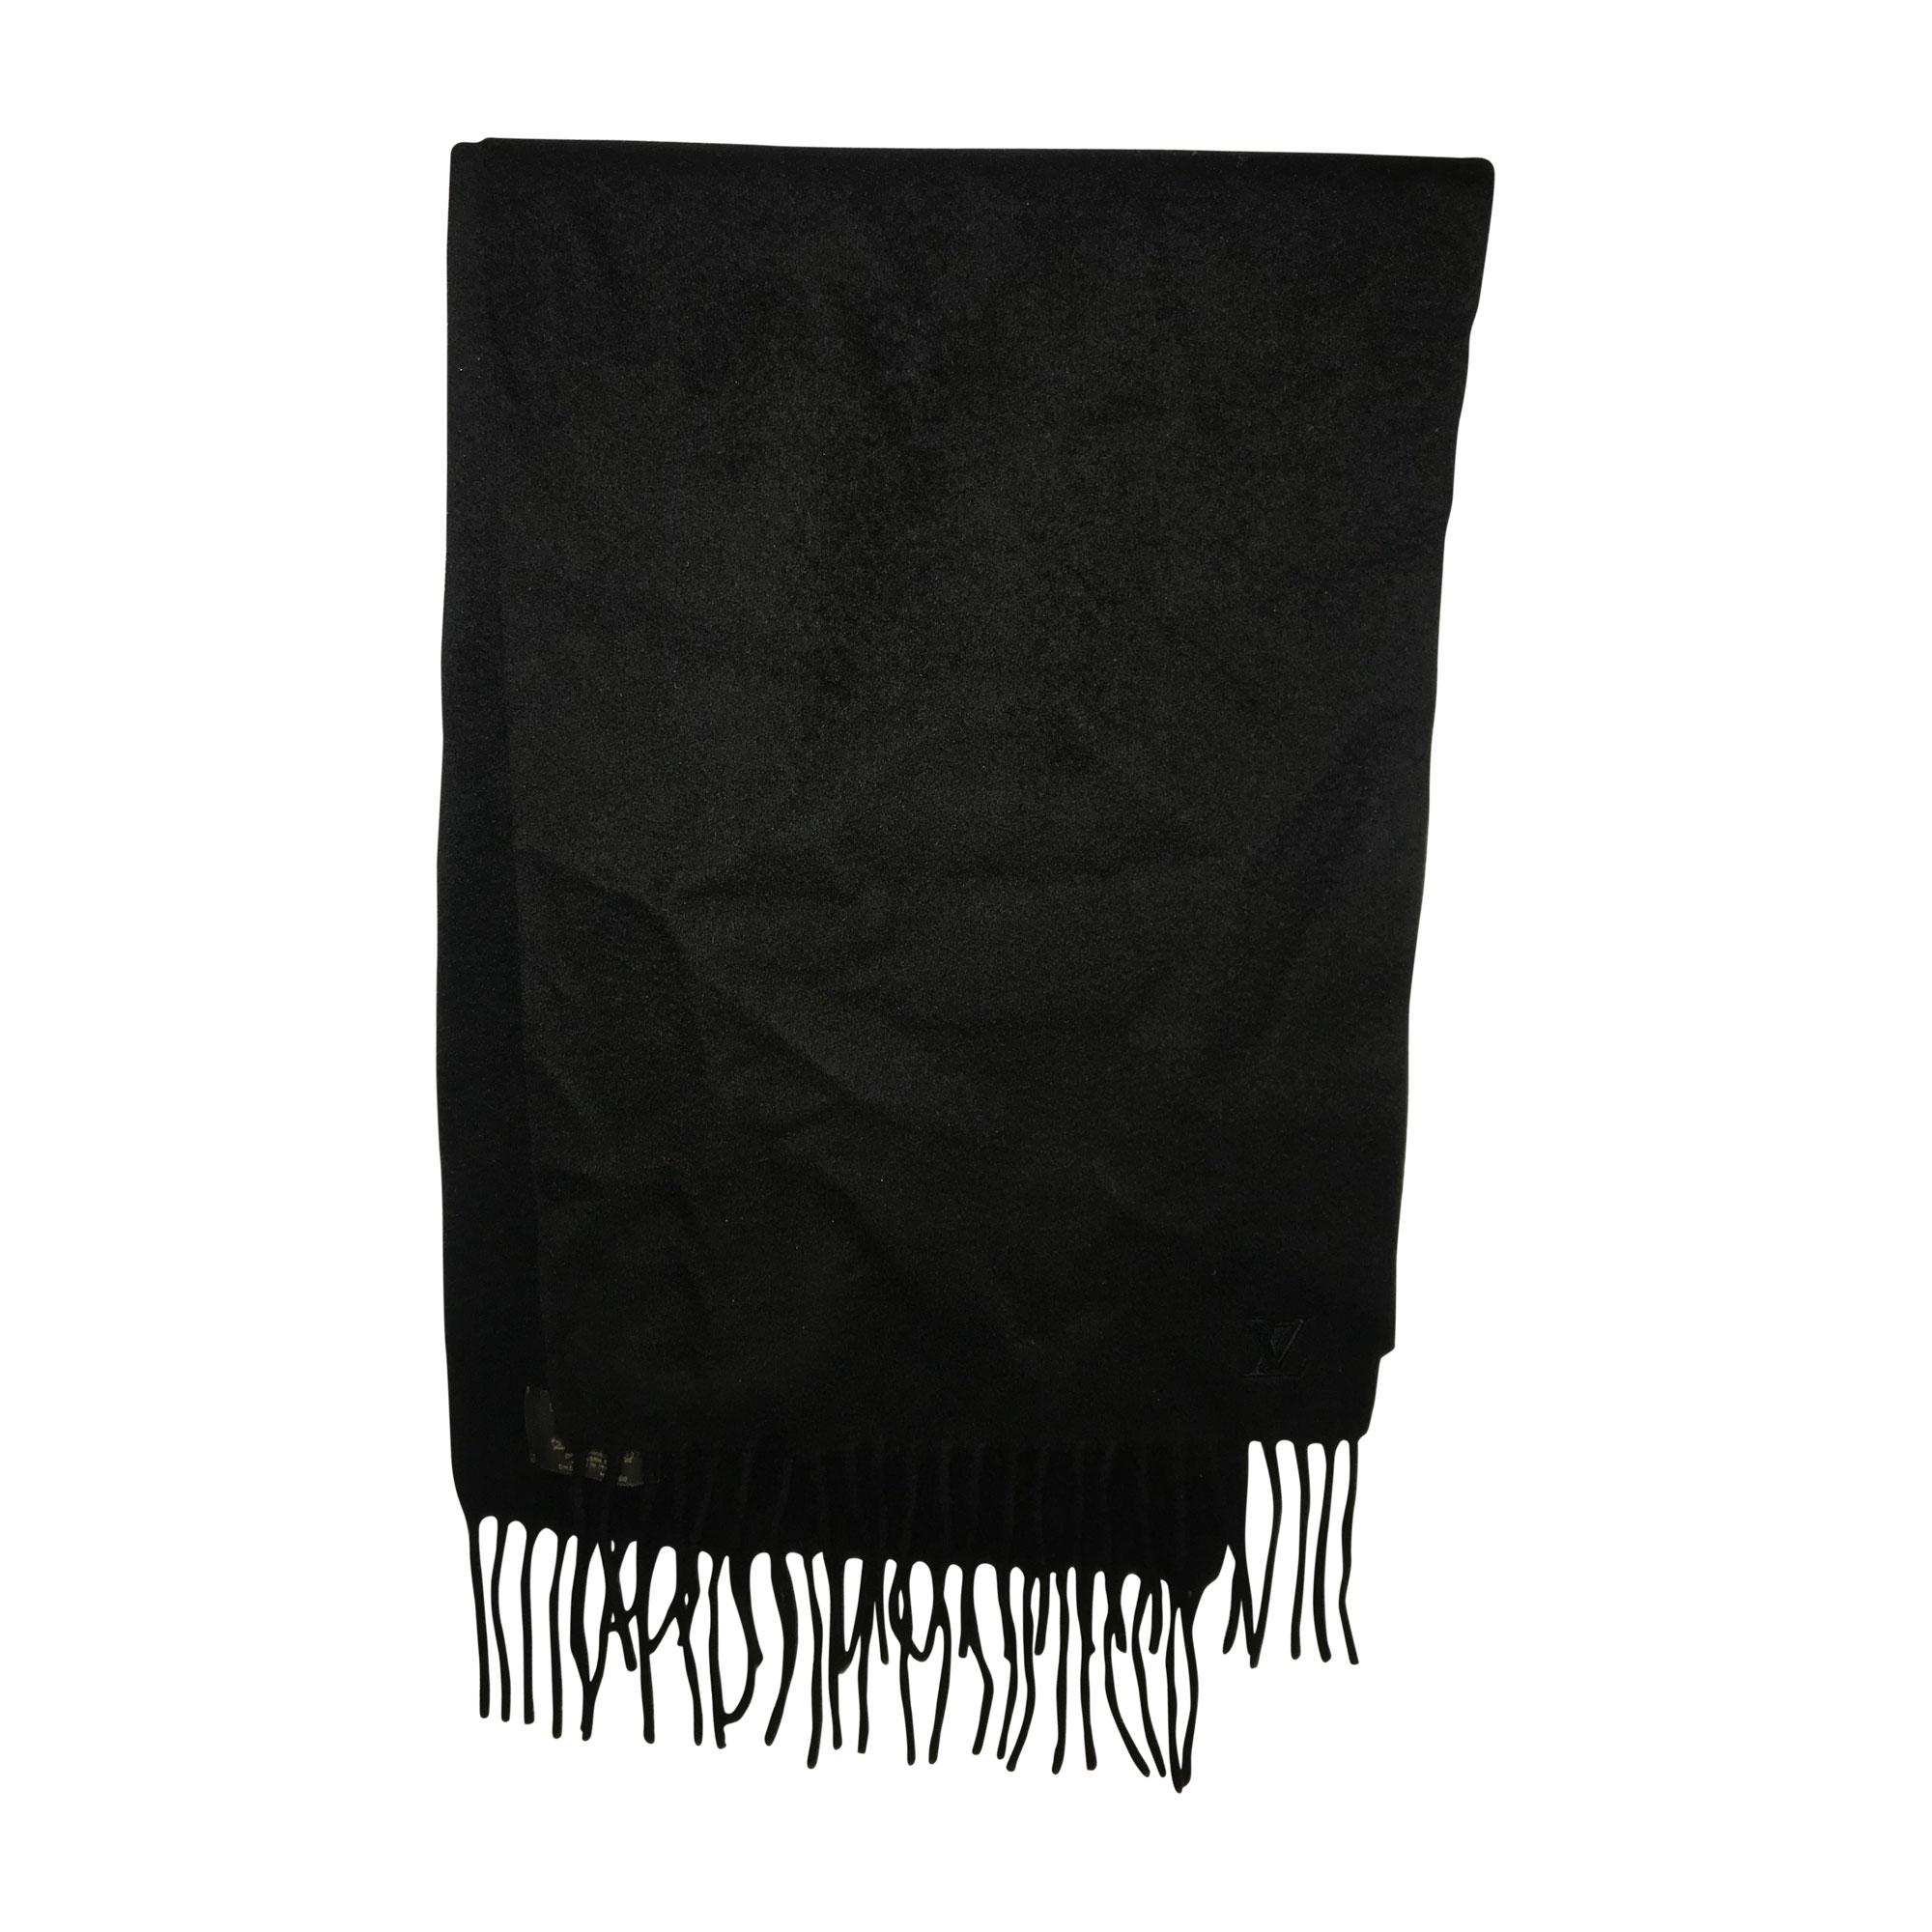 Echarpe LOUIS VUITTON noir - 7459157 1a8bfe4bb49